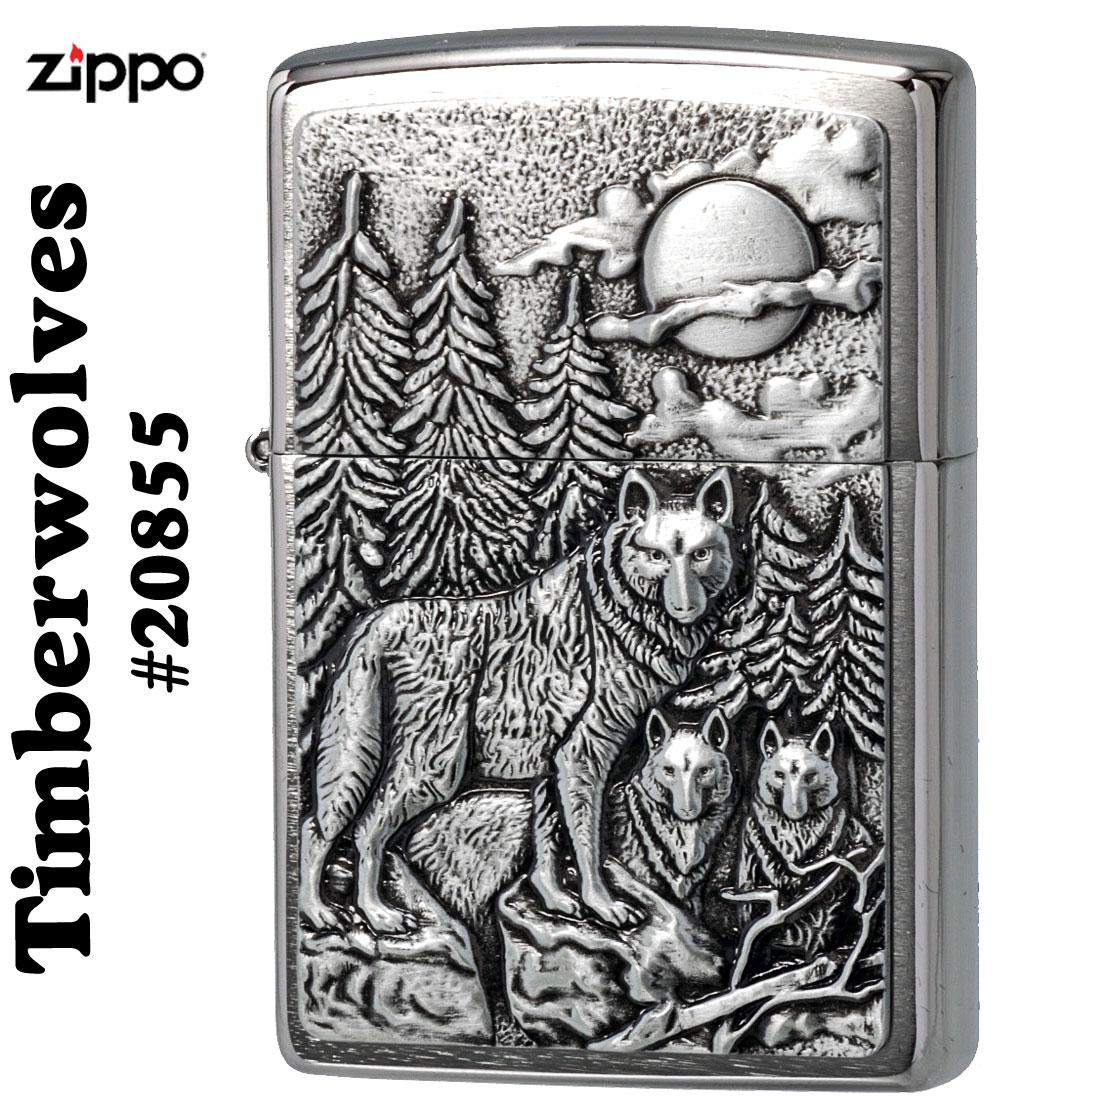 ZIPPO/Brushed Chrome Emblem Atached Timberwolves(狼) #20855画像